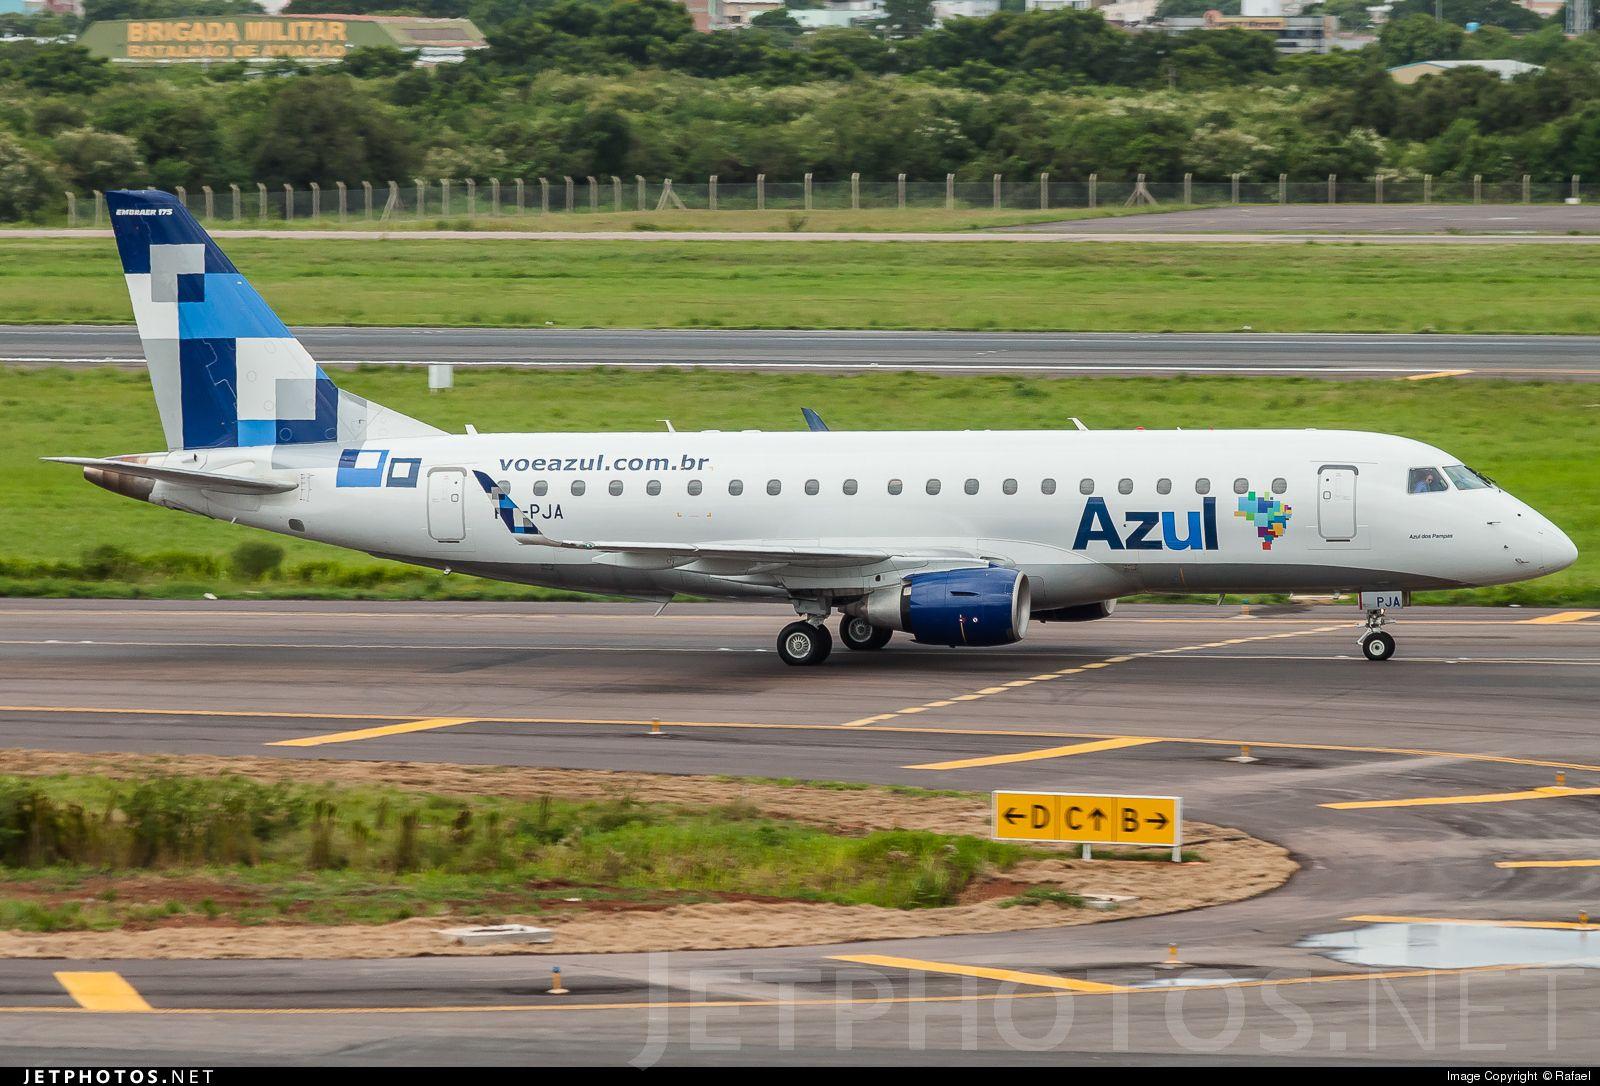 Azul Linhas Aéreas Brasileiras (BR) Historic fleet